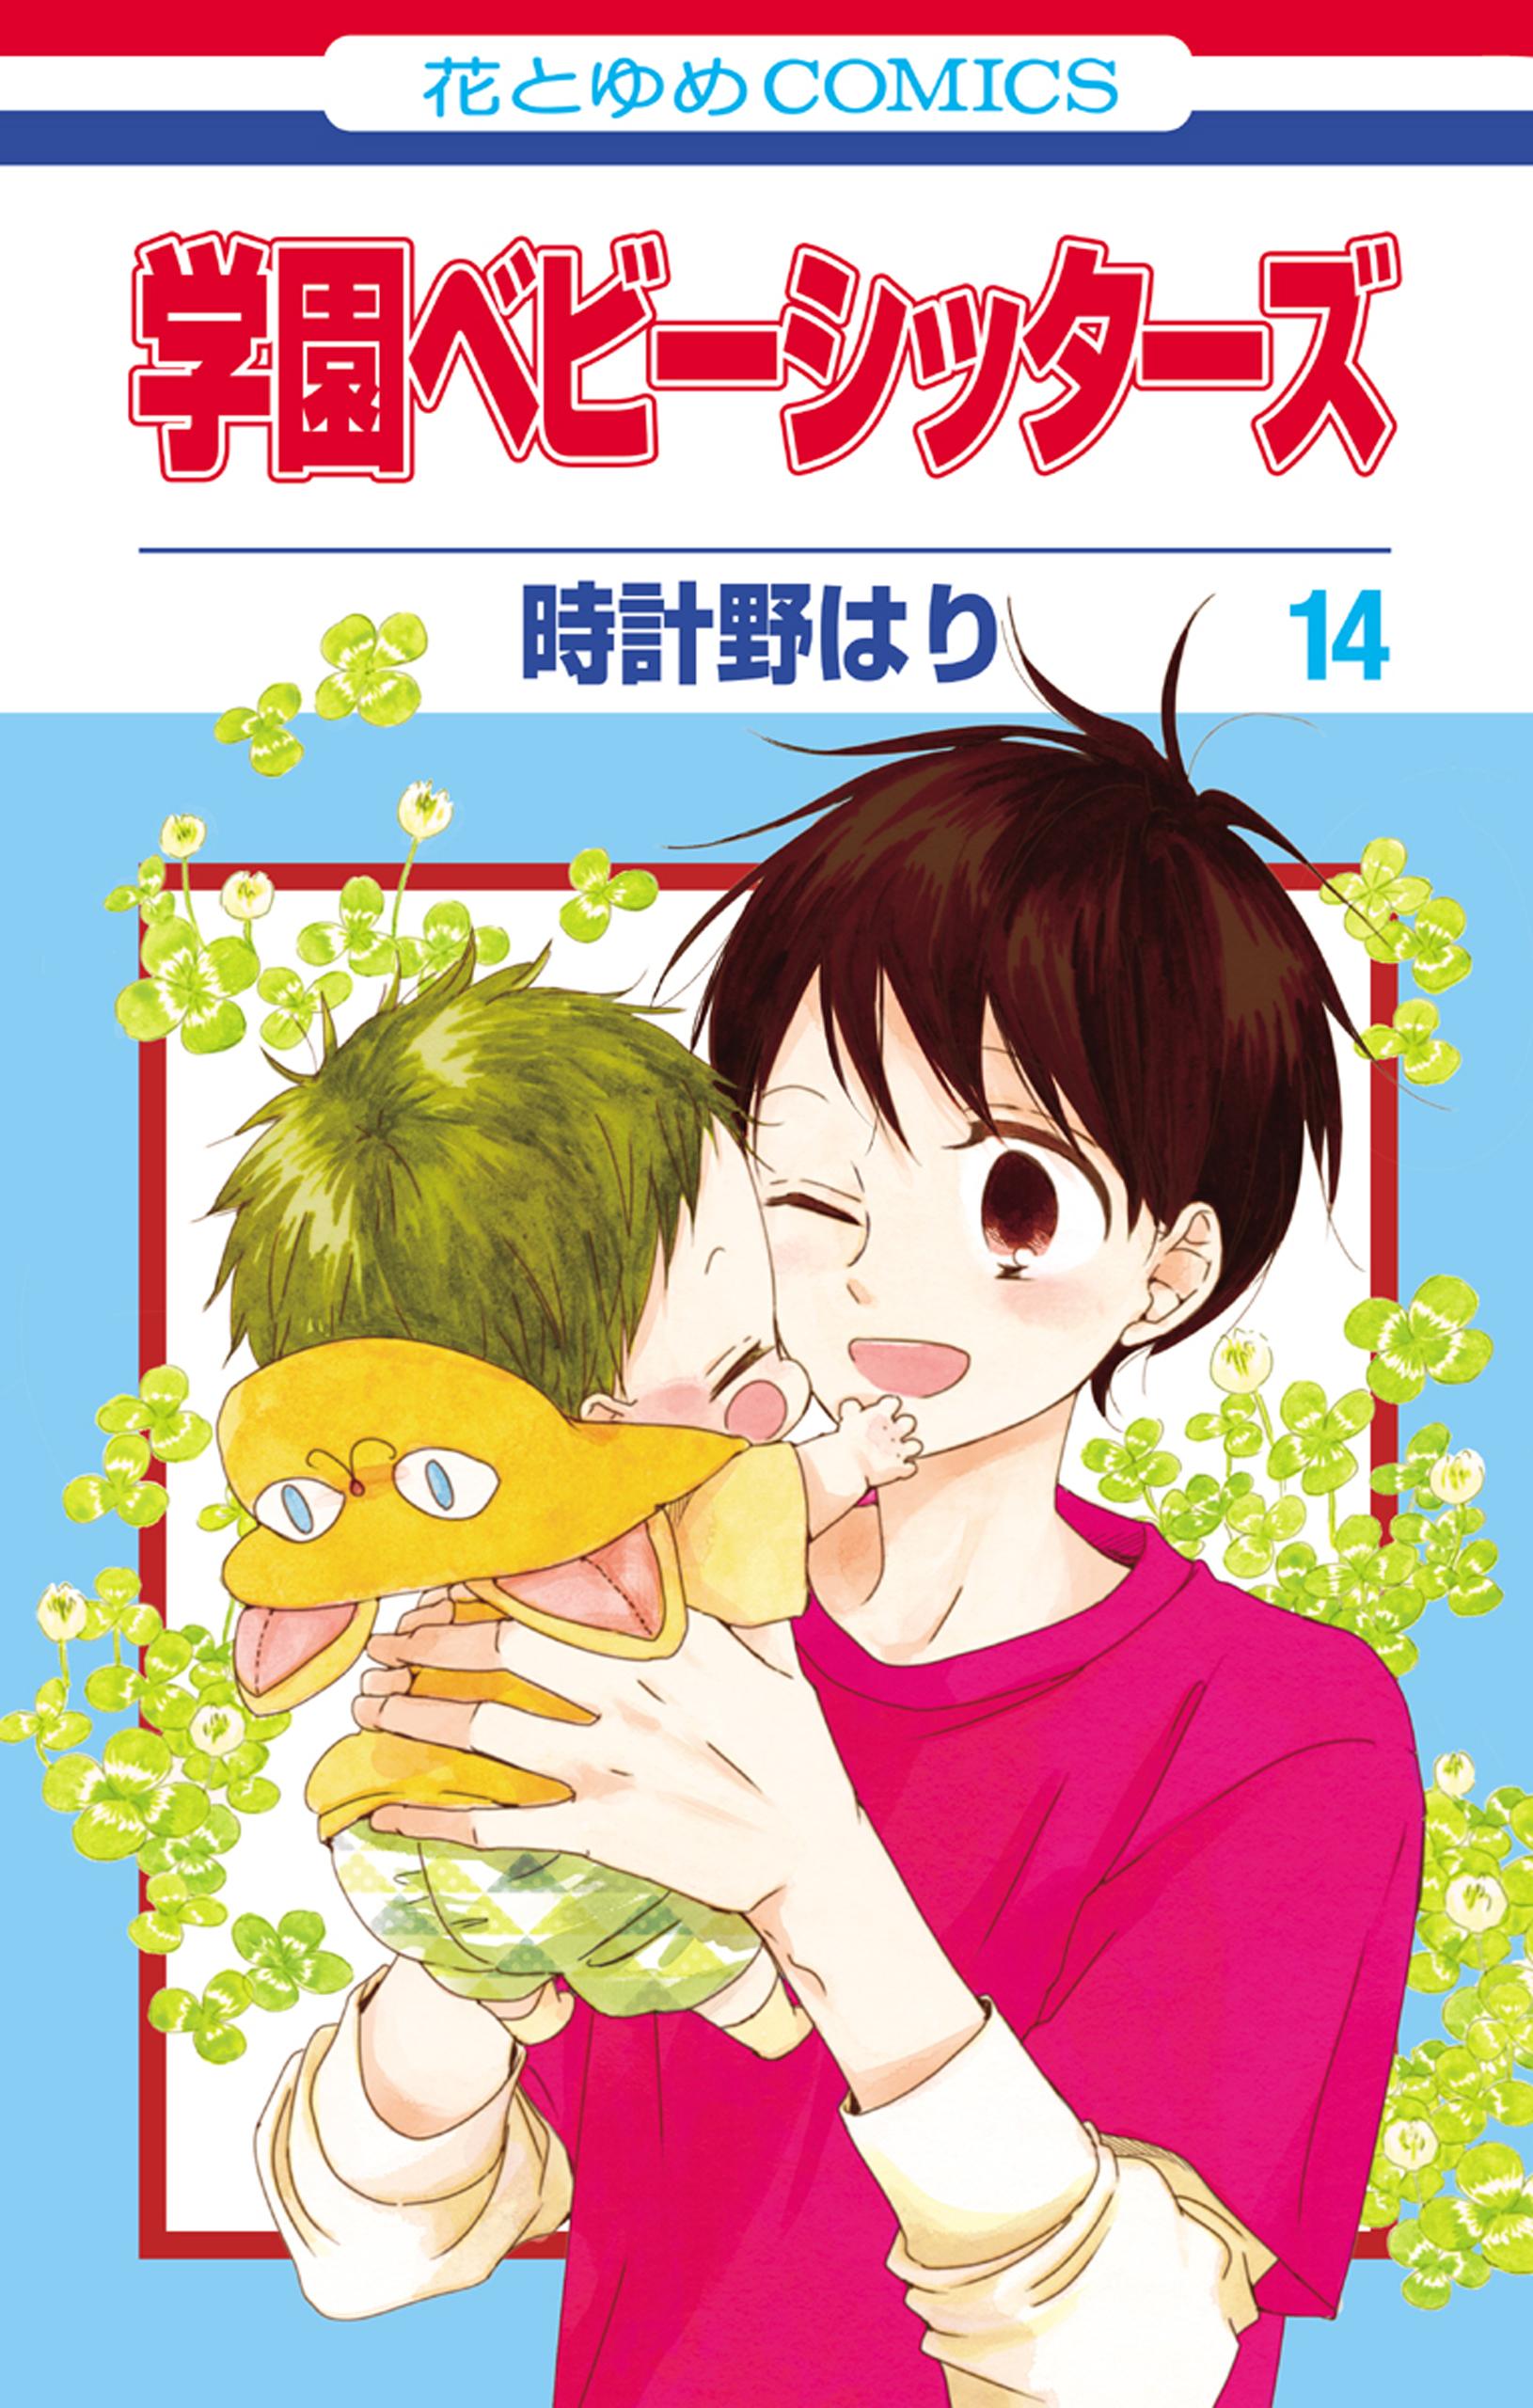 Gakuen Babysitters Wallpaper And Scan Gallery Minitokyo